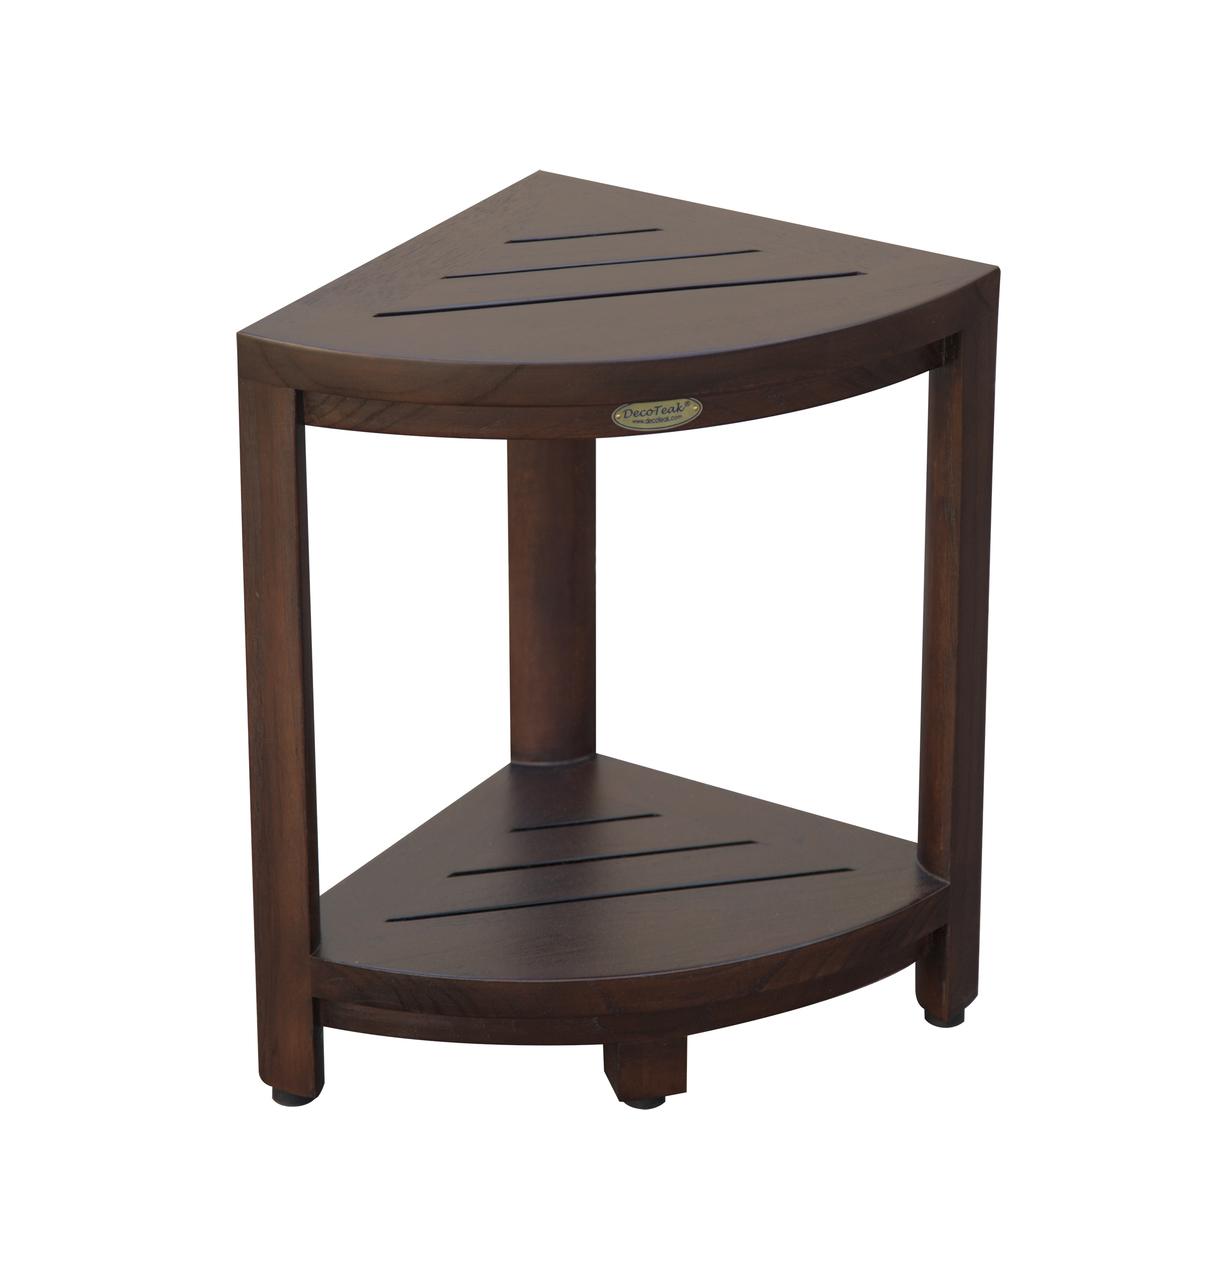 Terrific Decoteak Oasis 2 Tier Teak Corner Shower Shaving Foot Stool And Shelf Machost Co Dining Chair Design Ideas Machostcouk